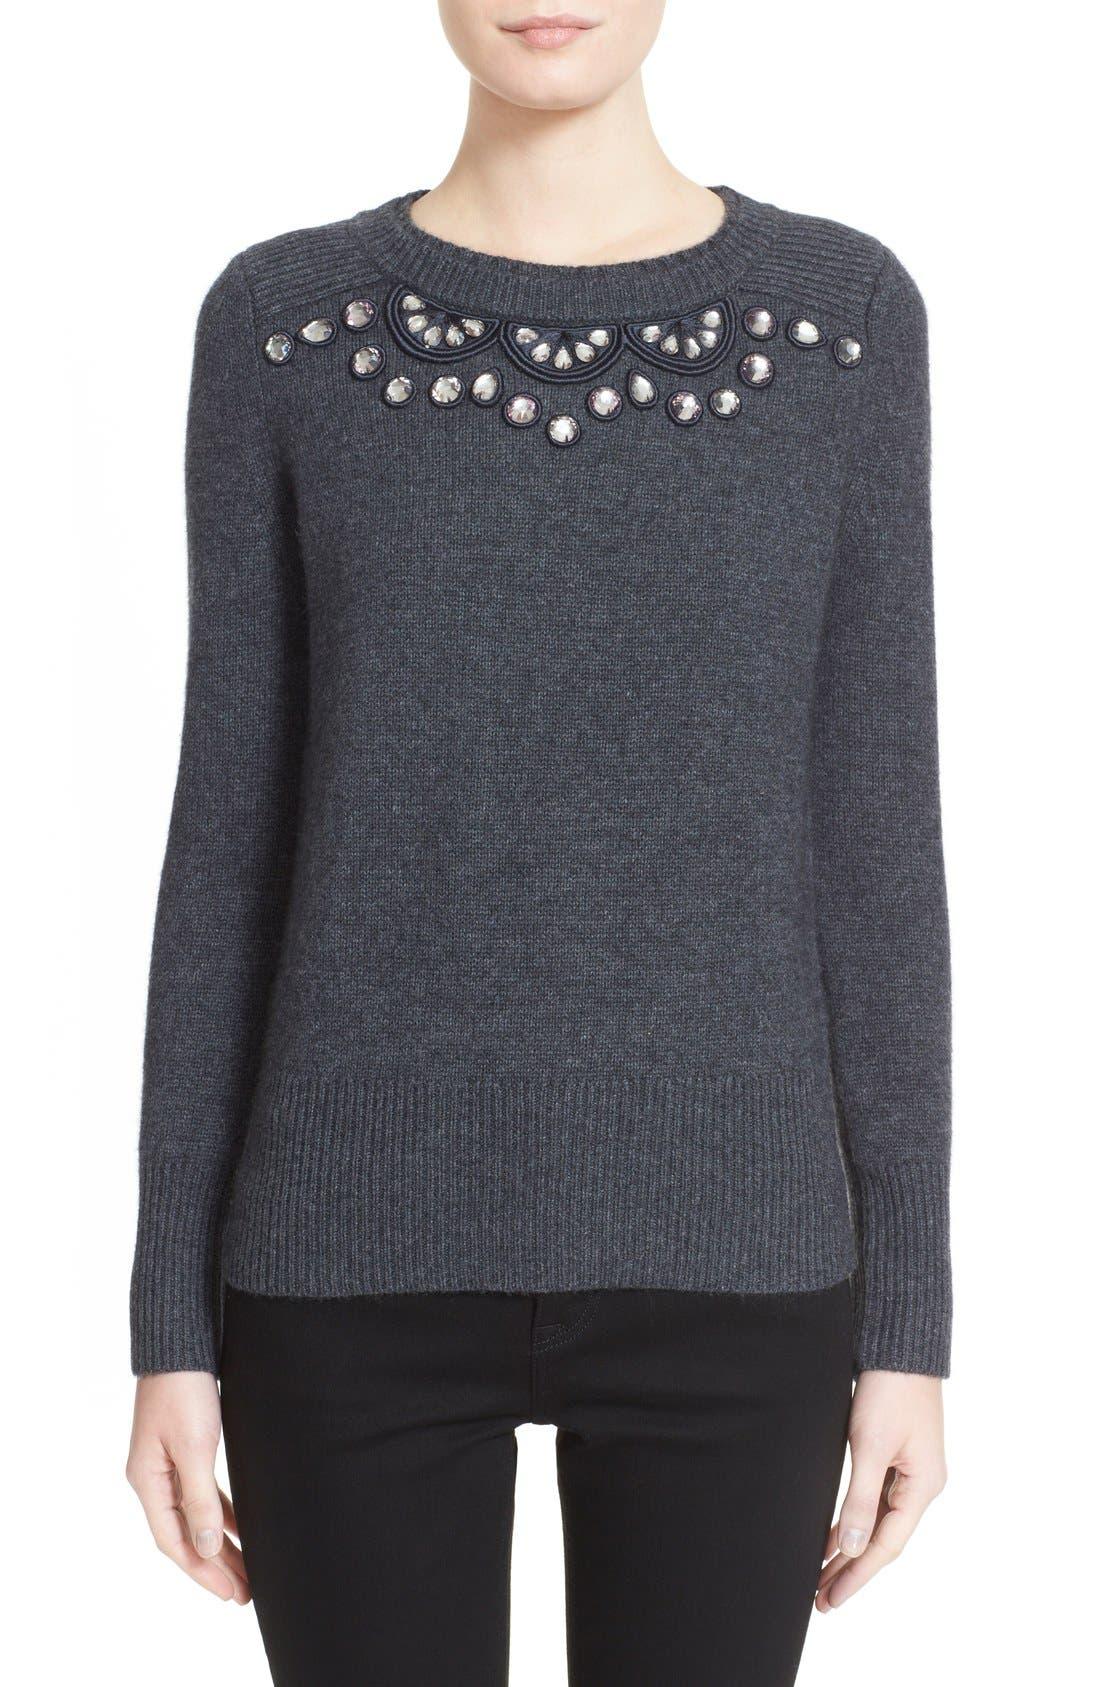 BURBERRY LONDON Embellished Crewneck Sweater, Main, color, 026